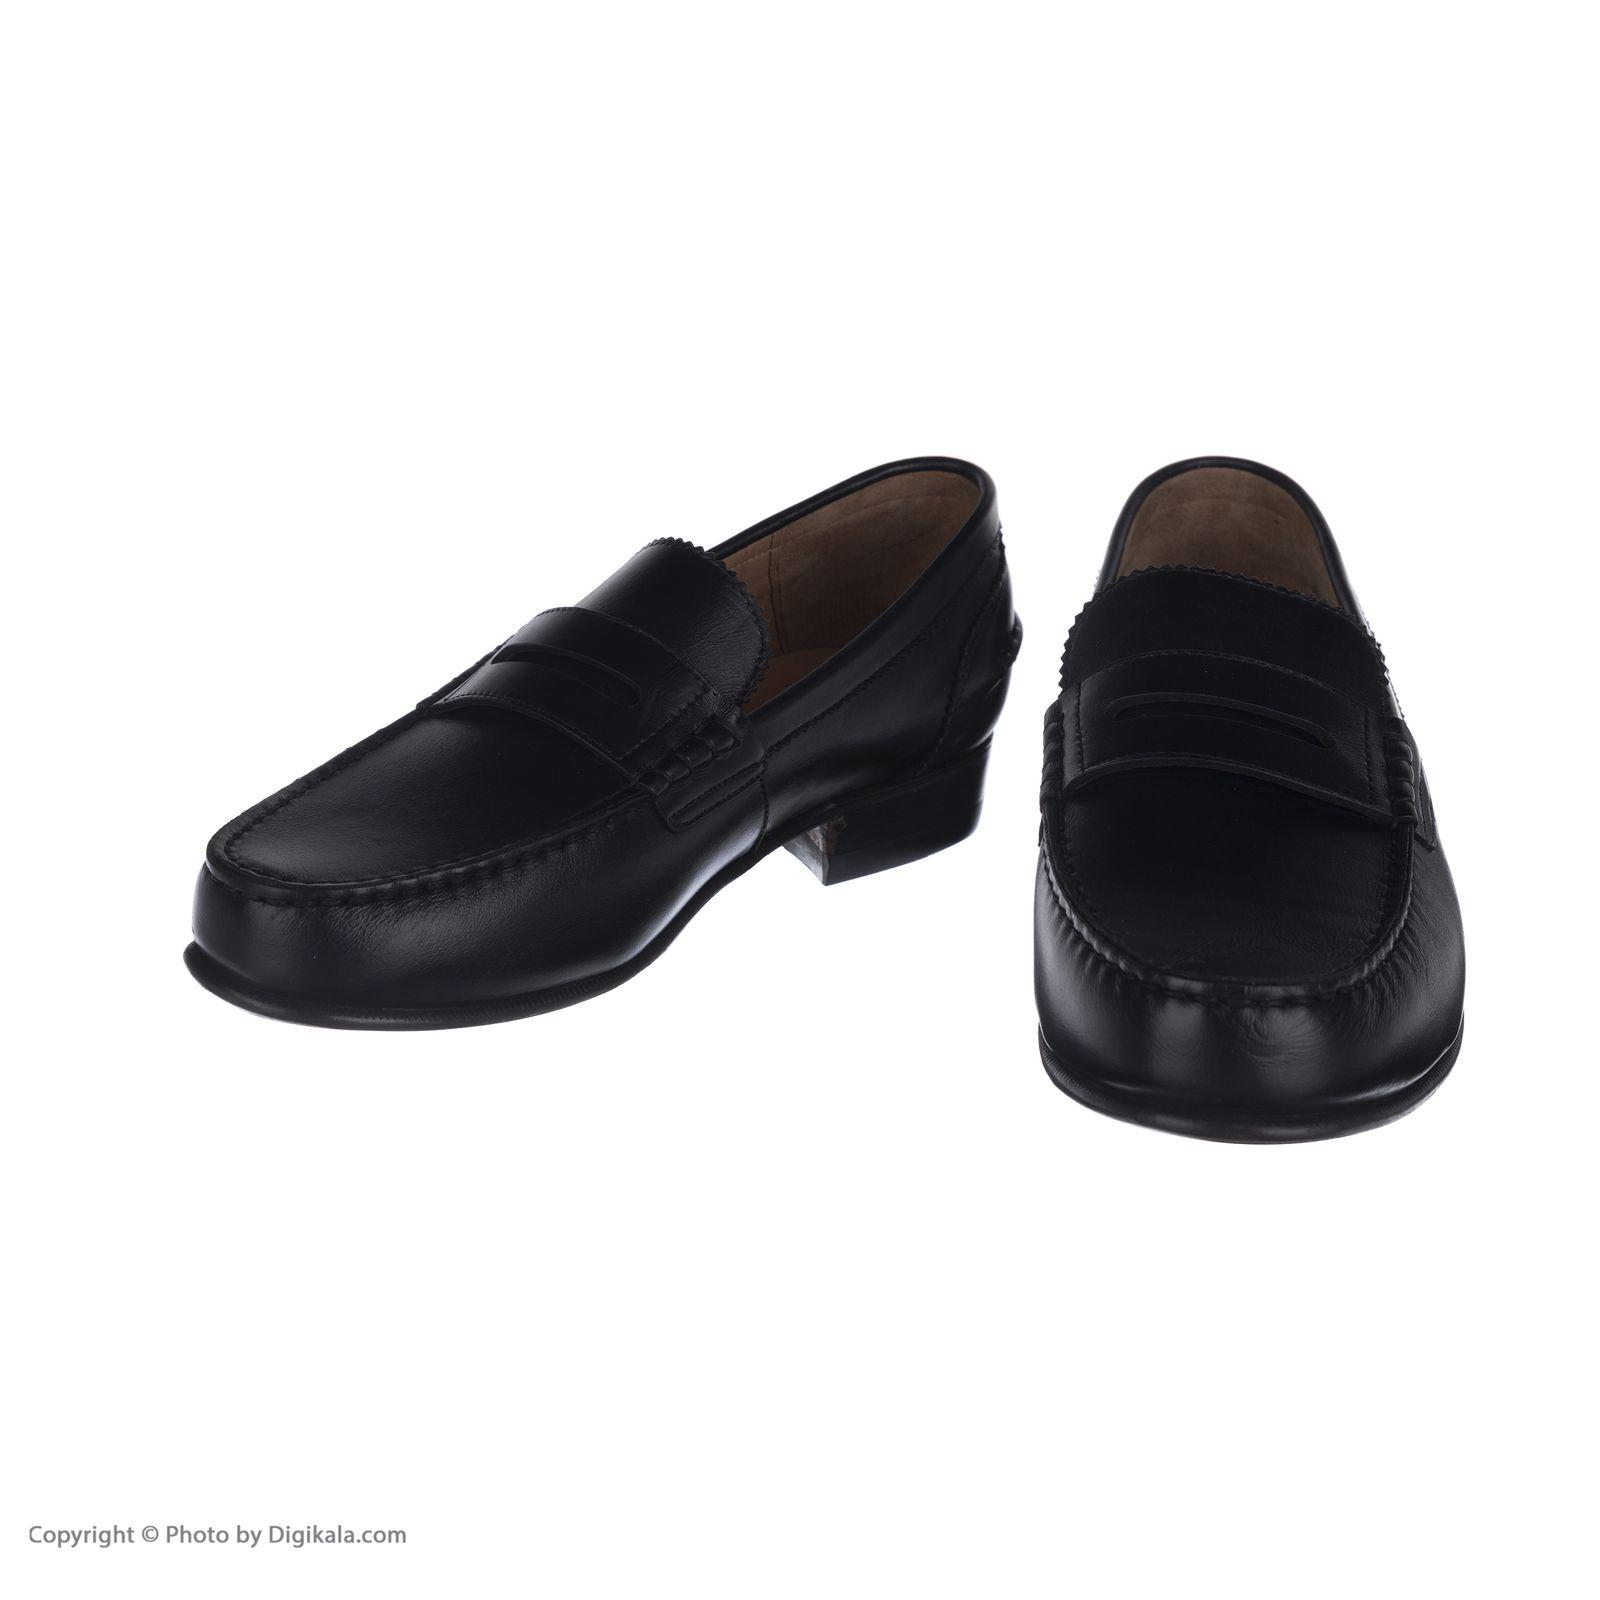 کفش مردانه نظری کد 410 -  - 4